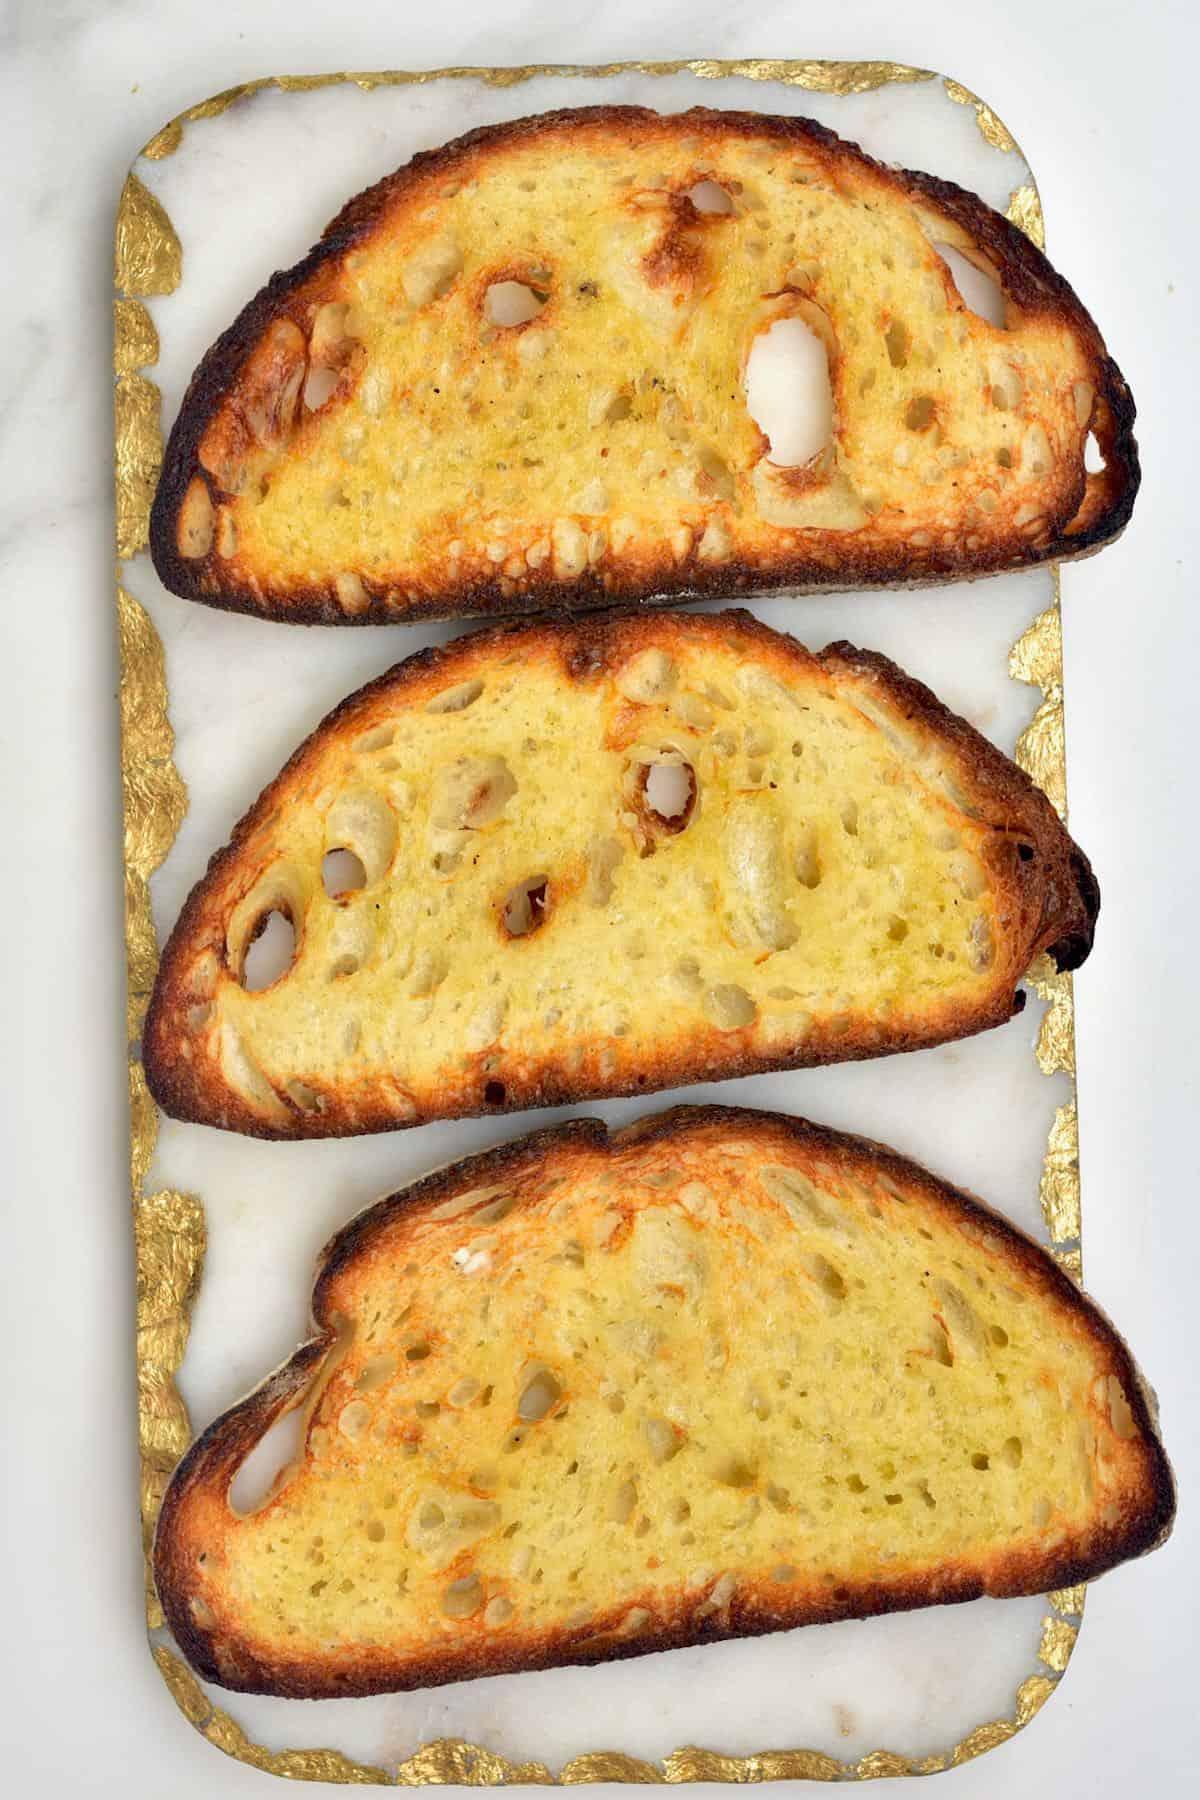 Three slices of toasted bread